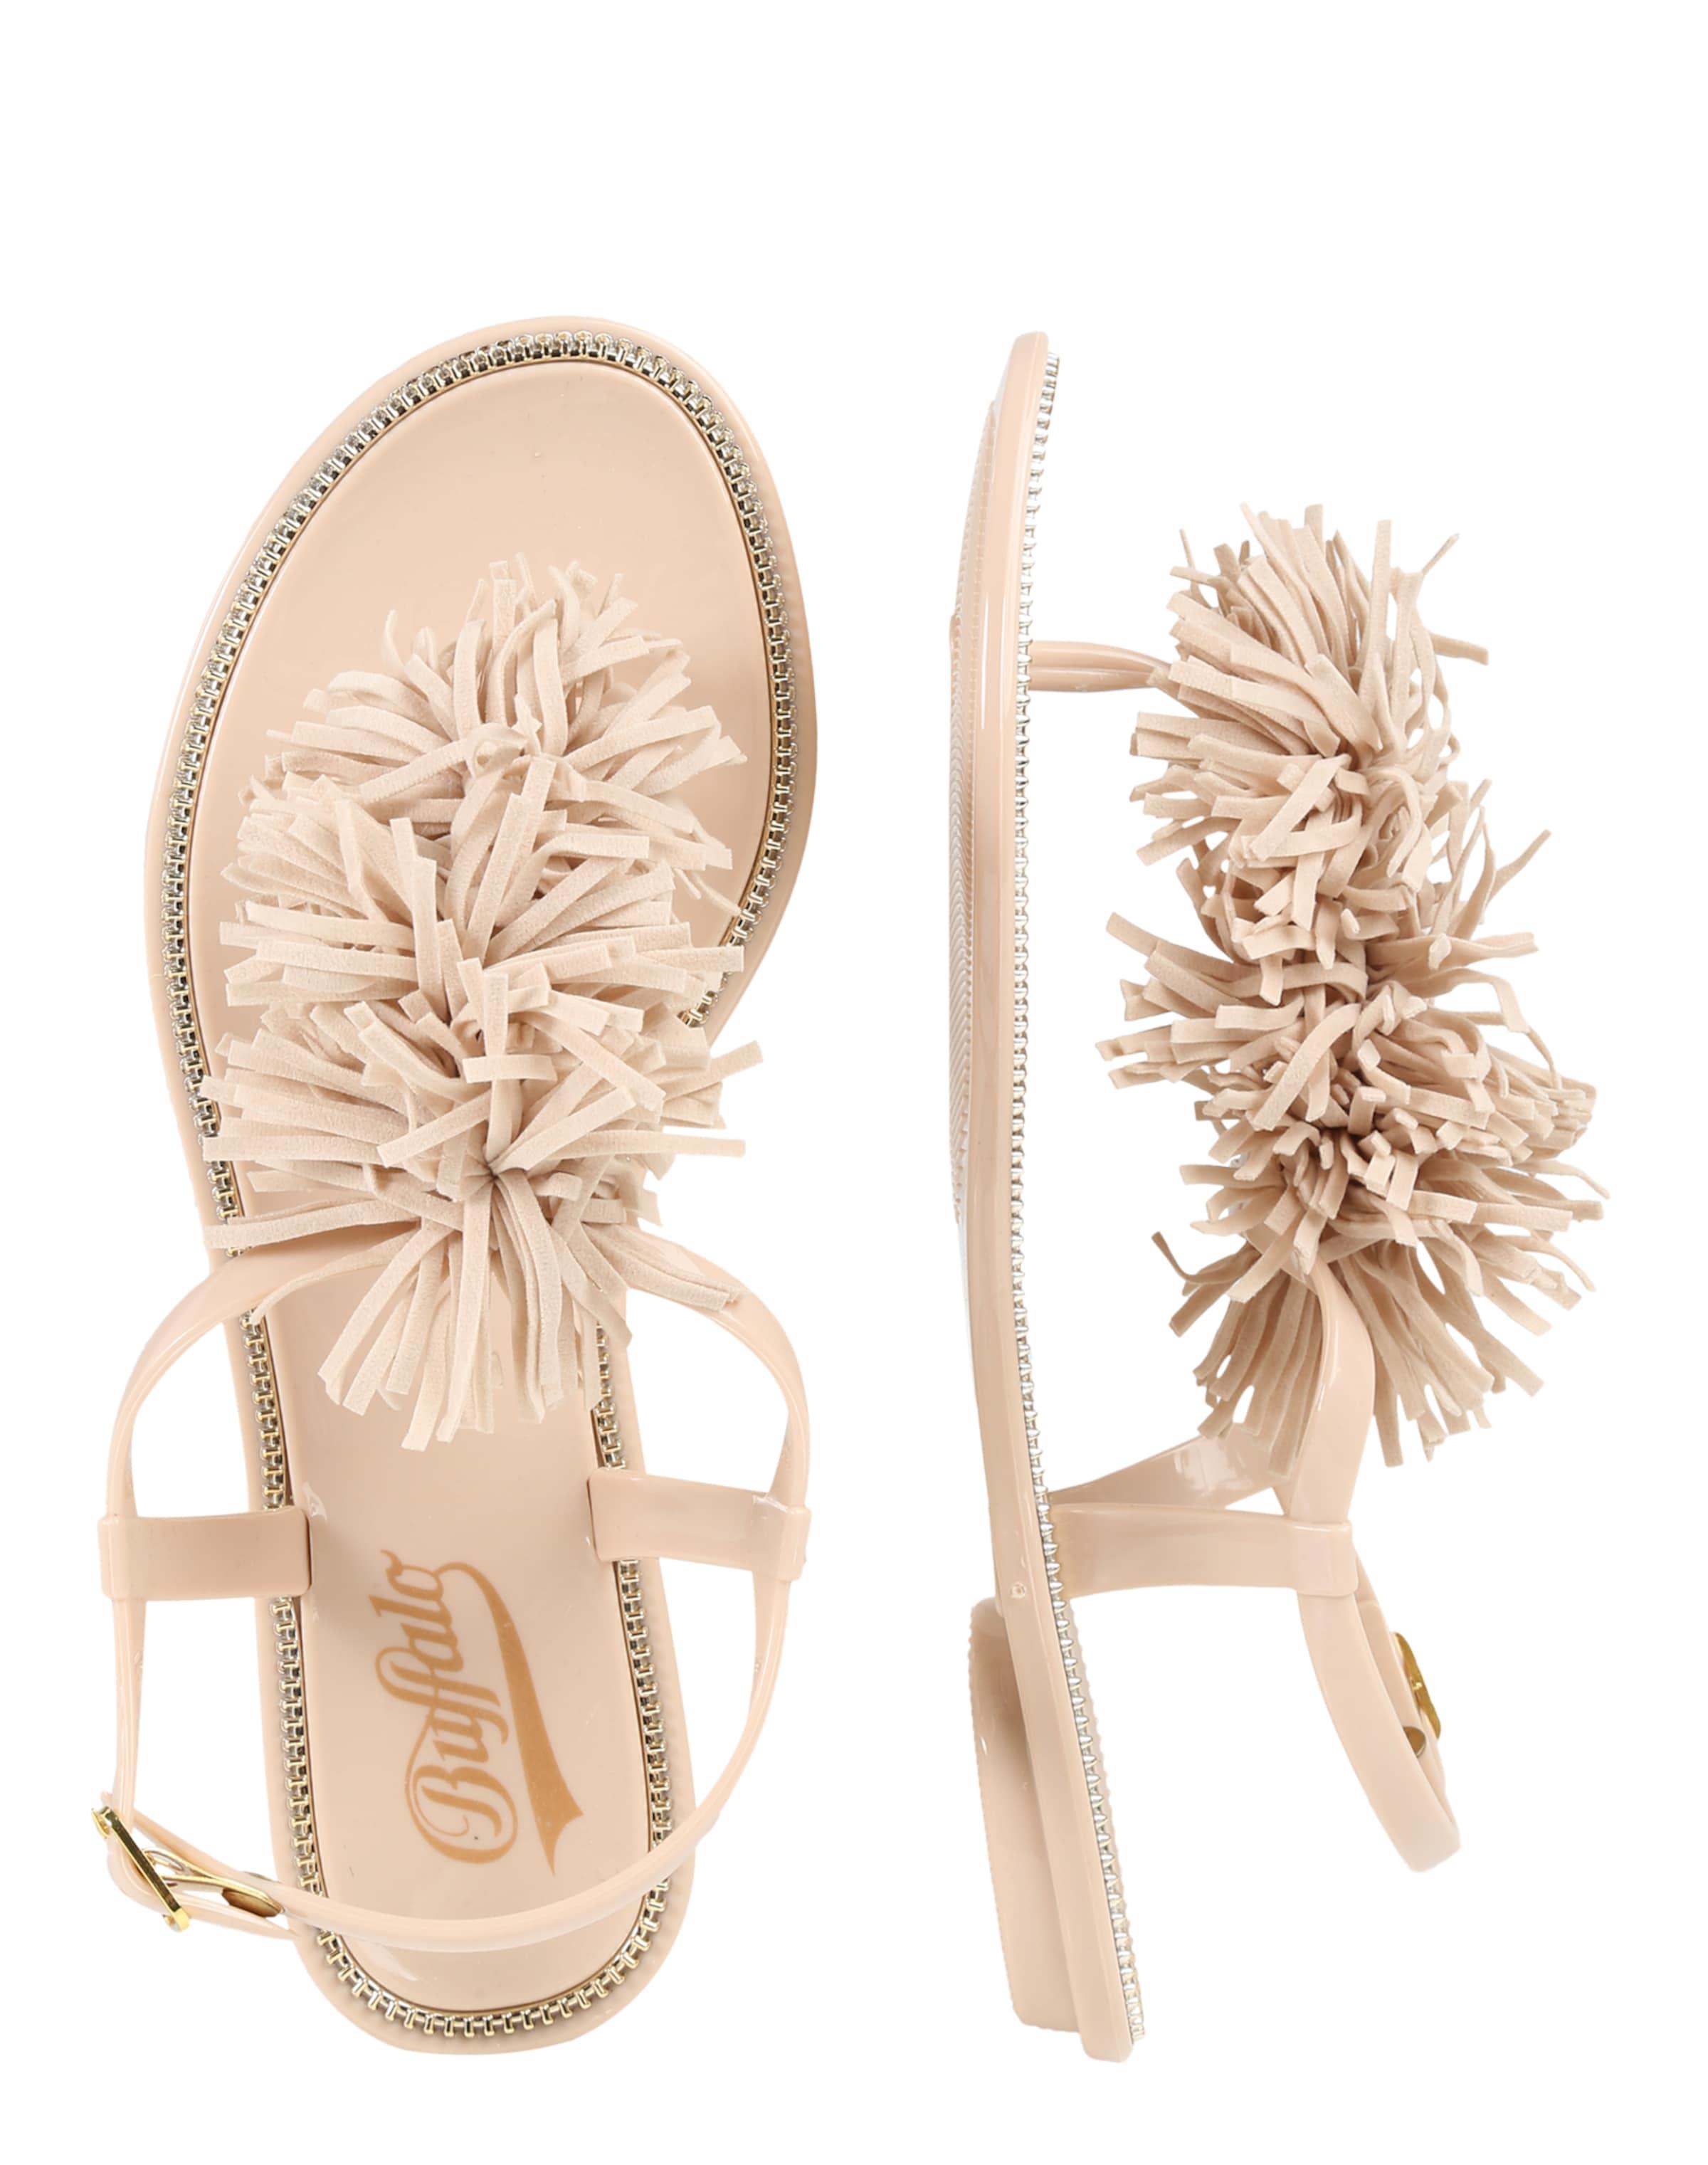 BUFFALO Sandaletten Günstig Kaufen Vorbestellung Billig Verkauf Visum Zahlung Outlet Mode-Stil 2uQnQkQ